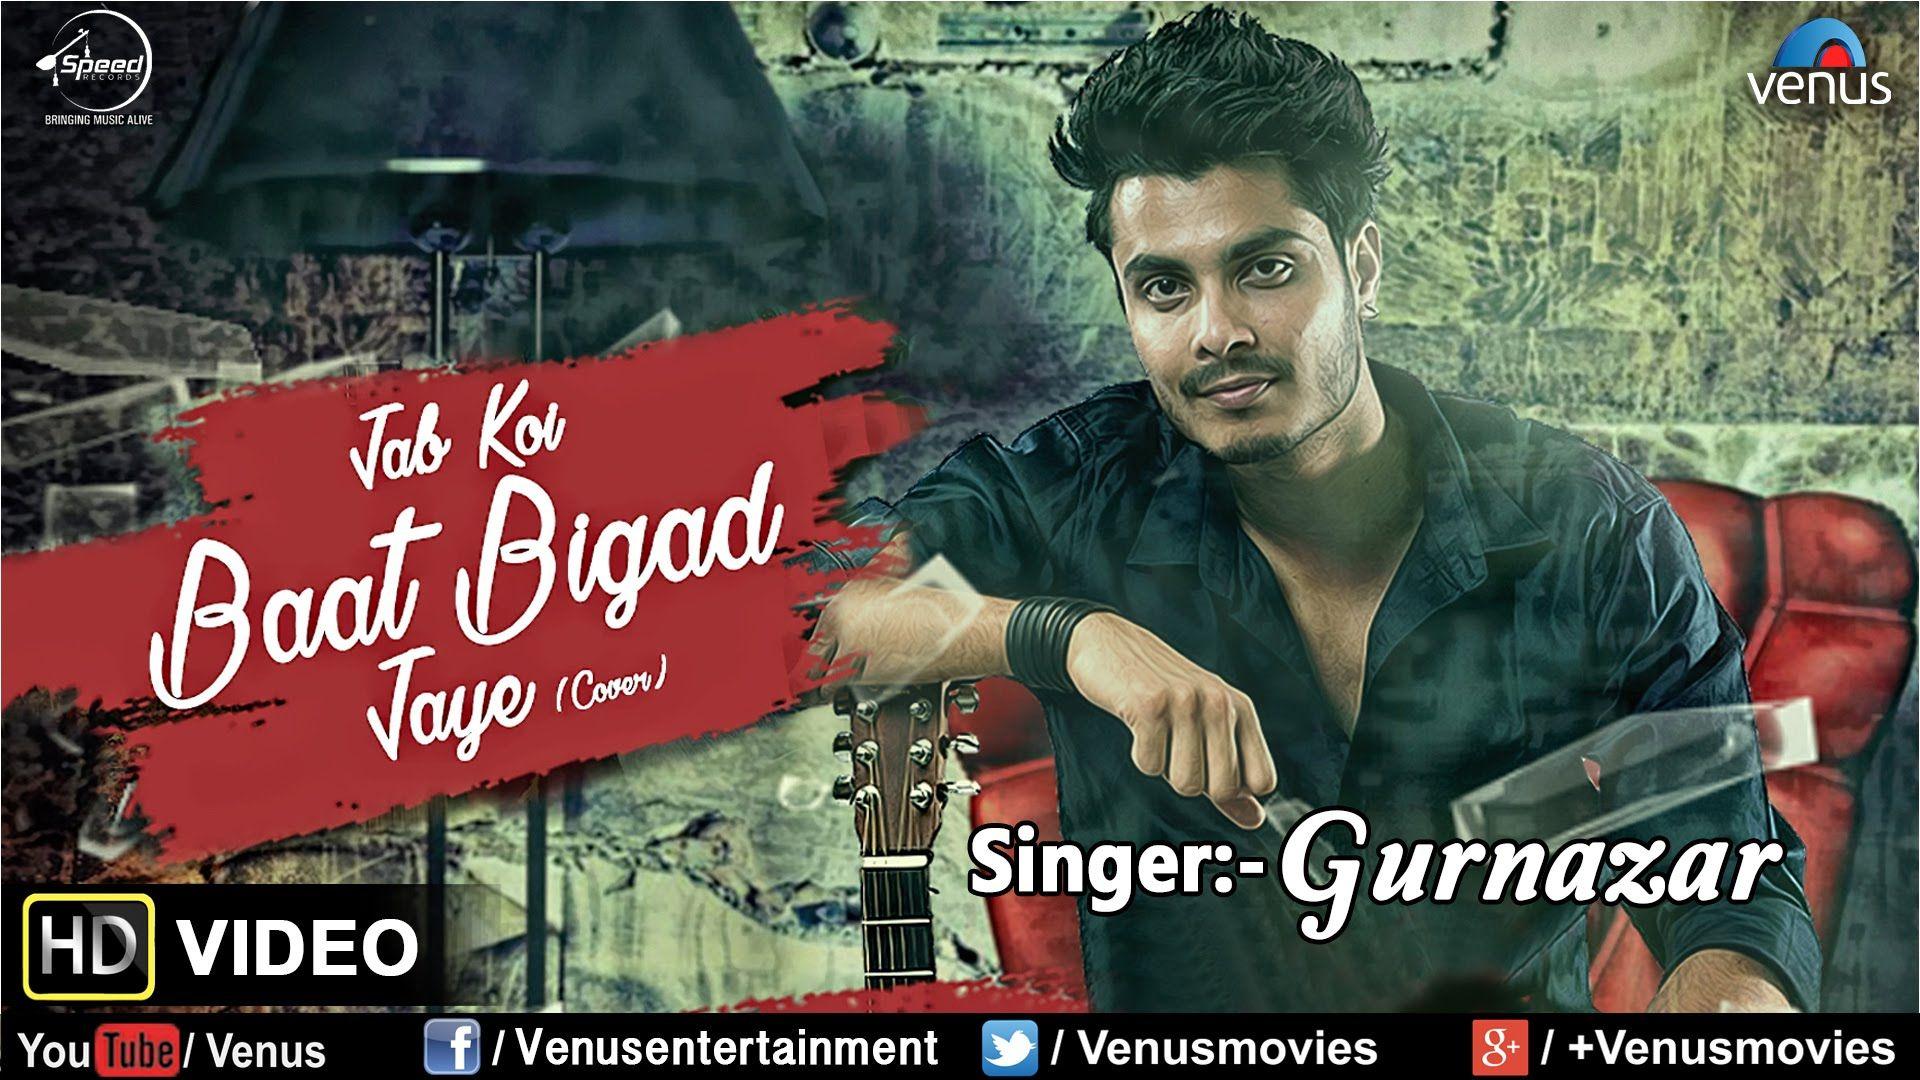 Jab Koi Baat Bigad Jaye Cover Song Gurnazar Singles Top Chart 14 Cover Songs Songs Bollywood Songs